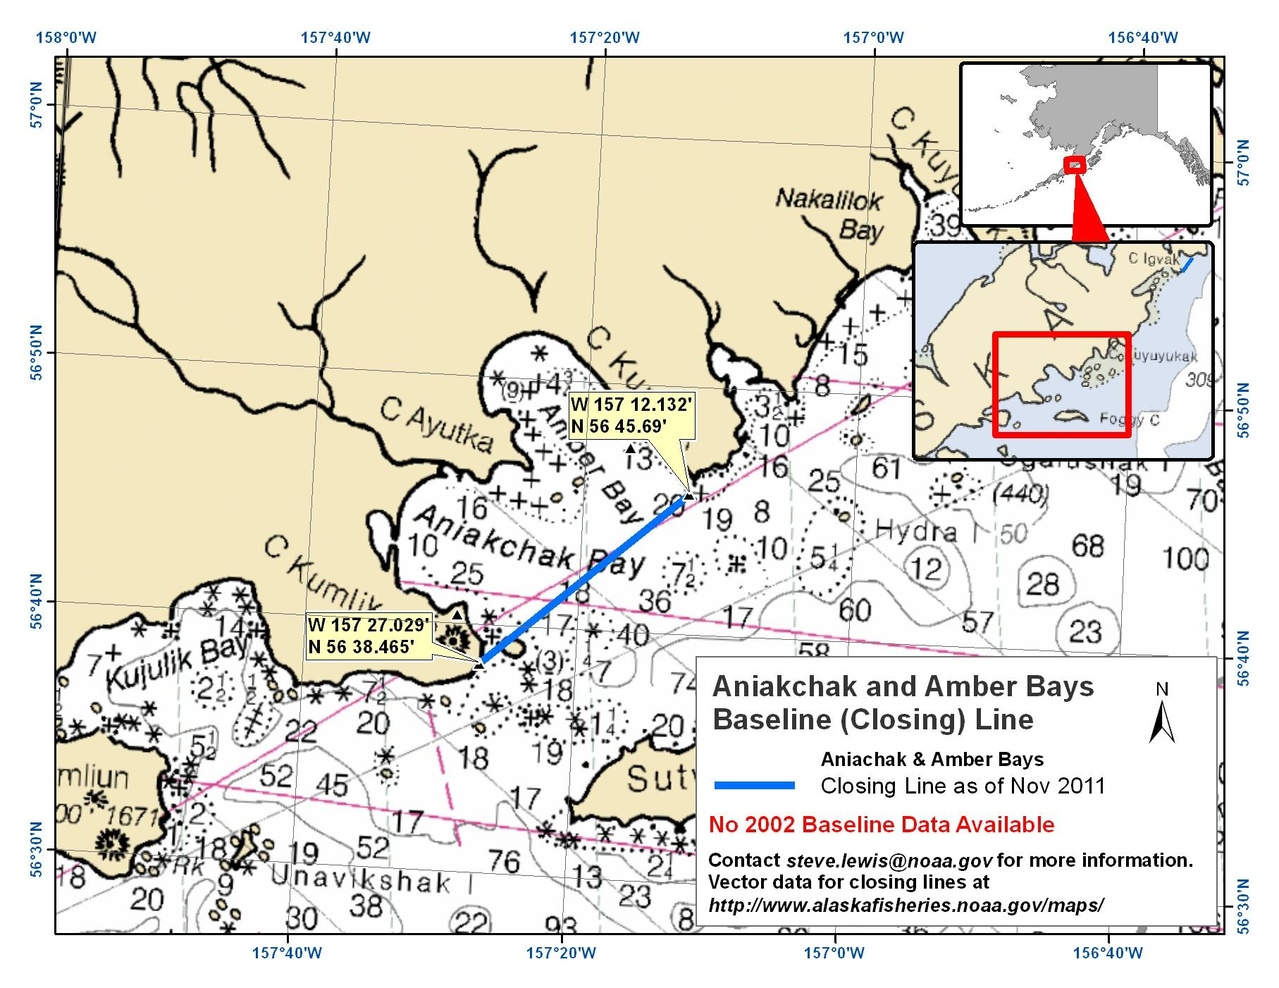 Chart for Amber Bay and Aniakchak Bay